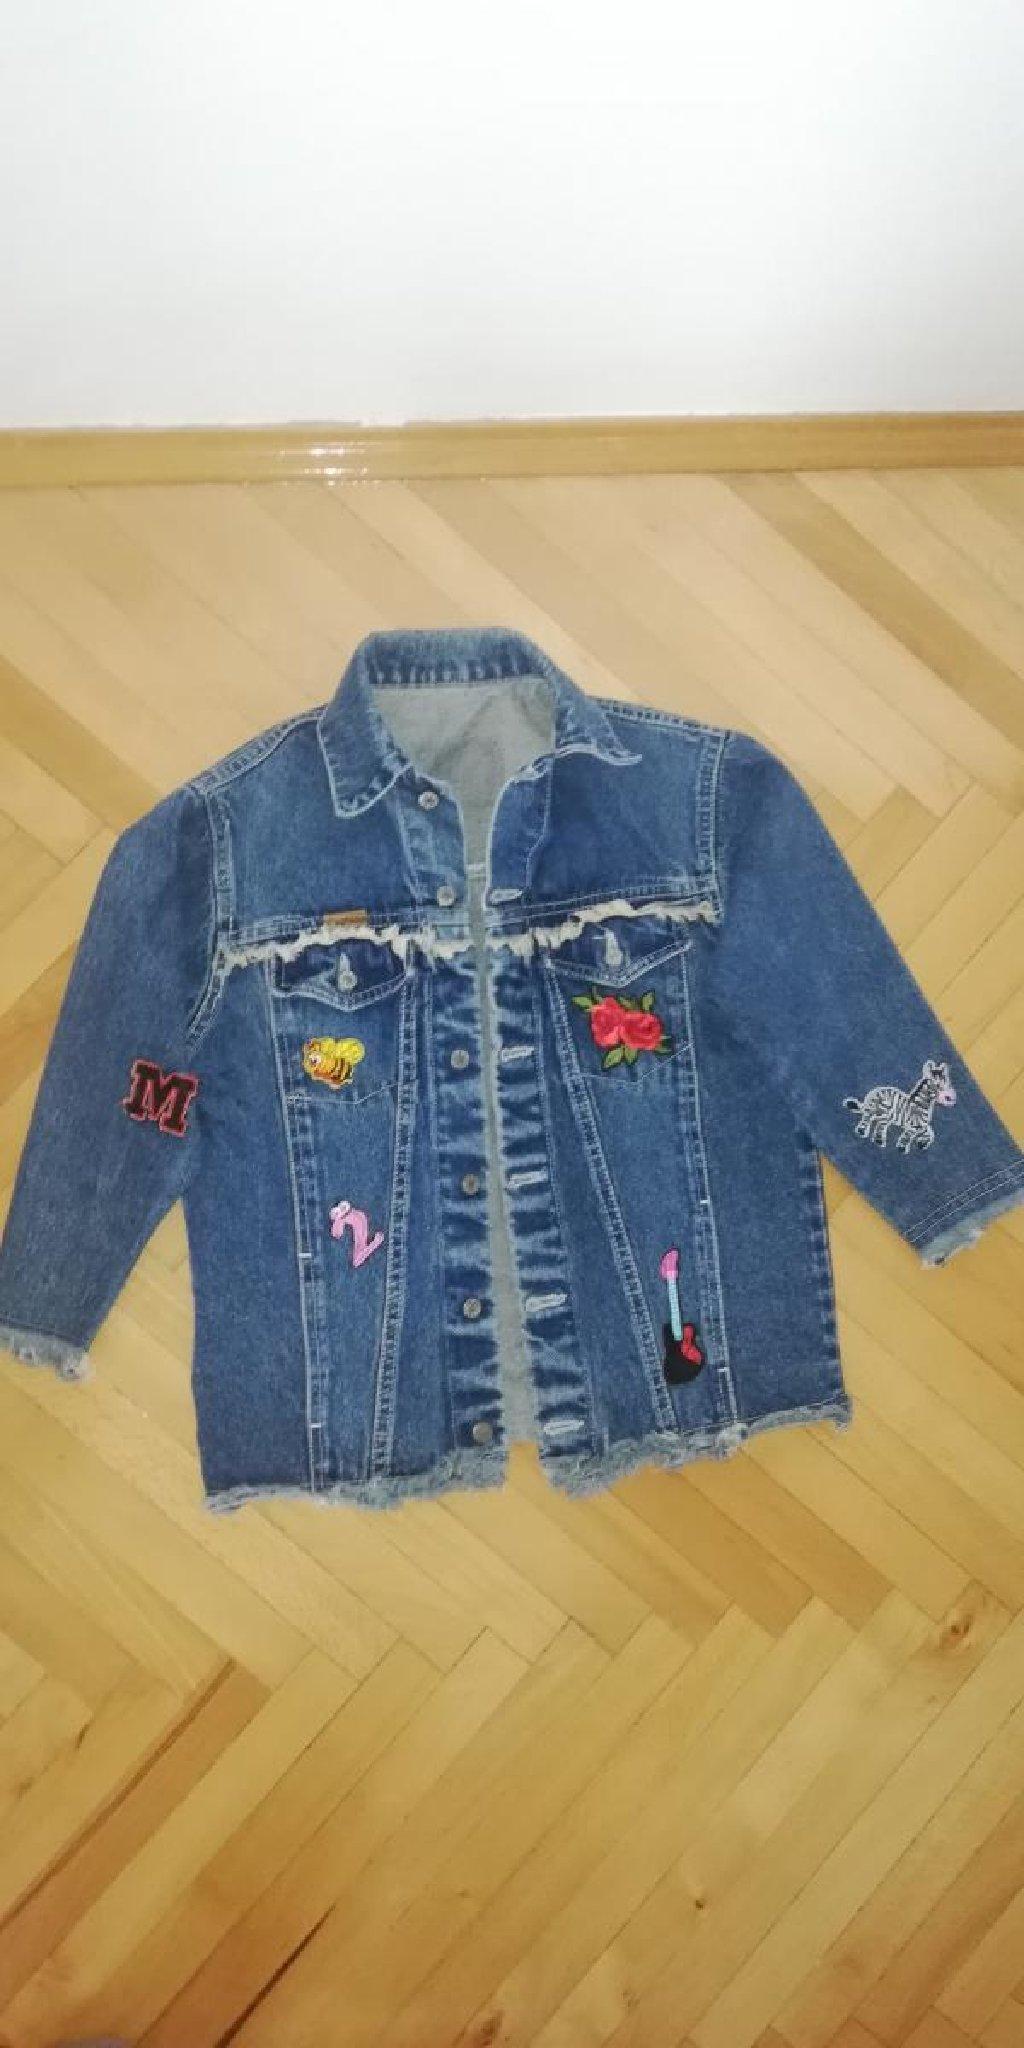 Jakna vel. 6/8 U extra stanju jaknica sa stikerima